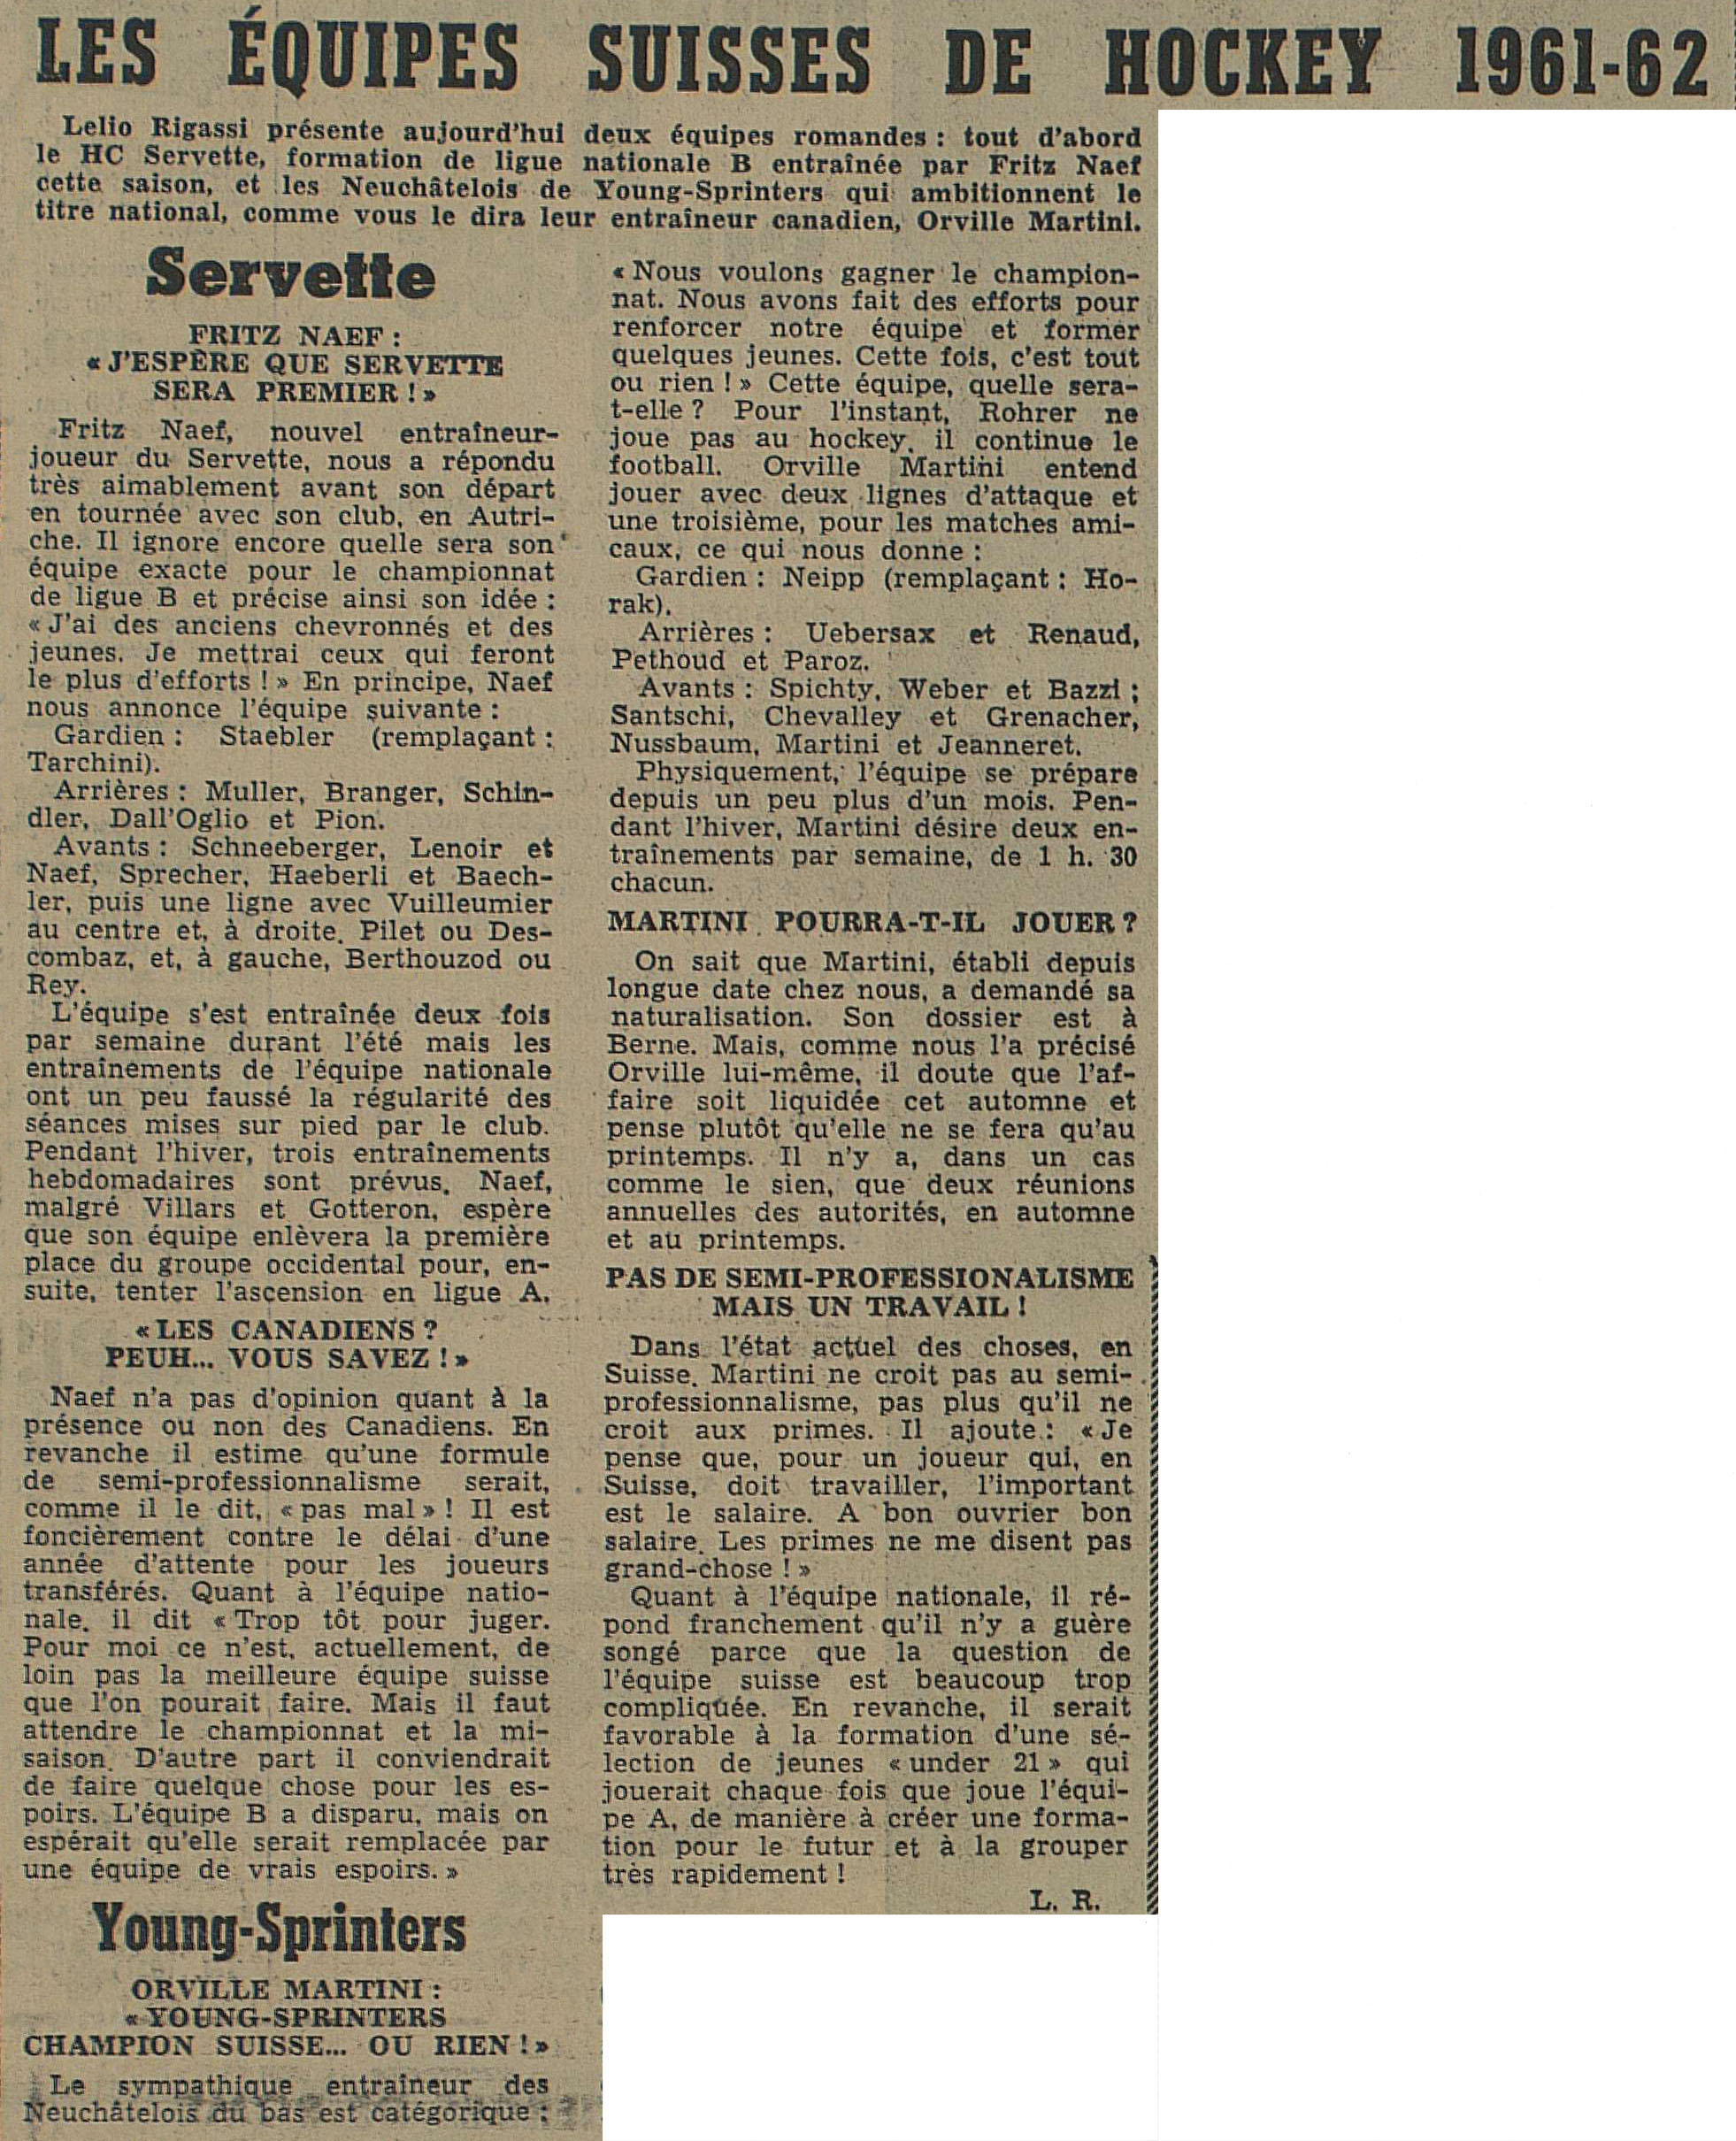 Le Matin - Tribune de Lausanne_19611025_e5oi61.jpg